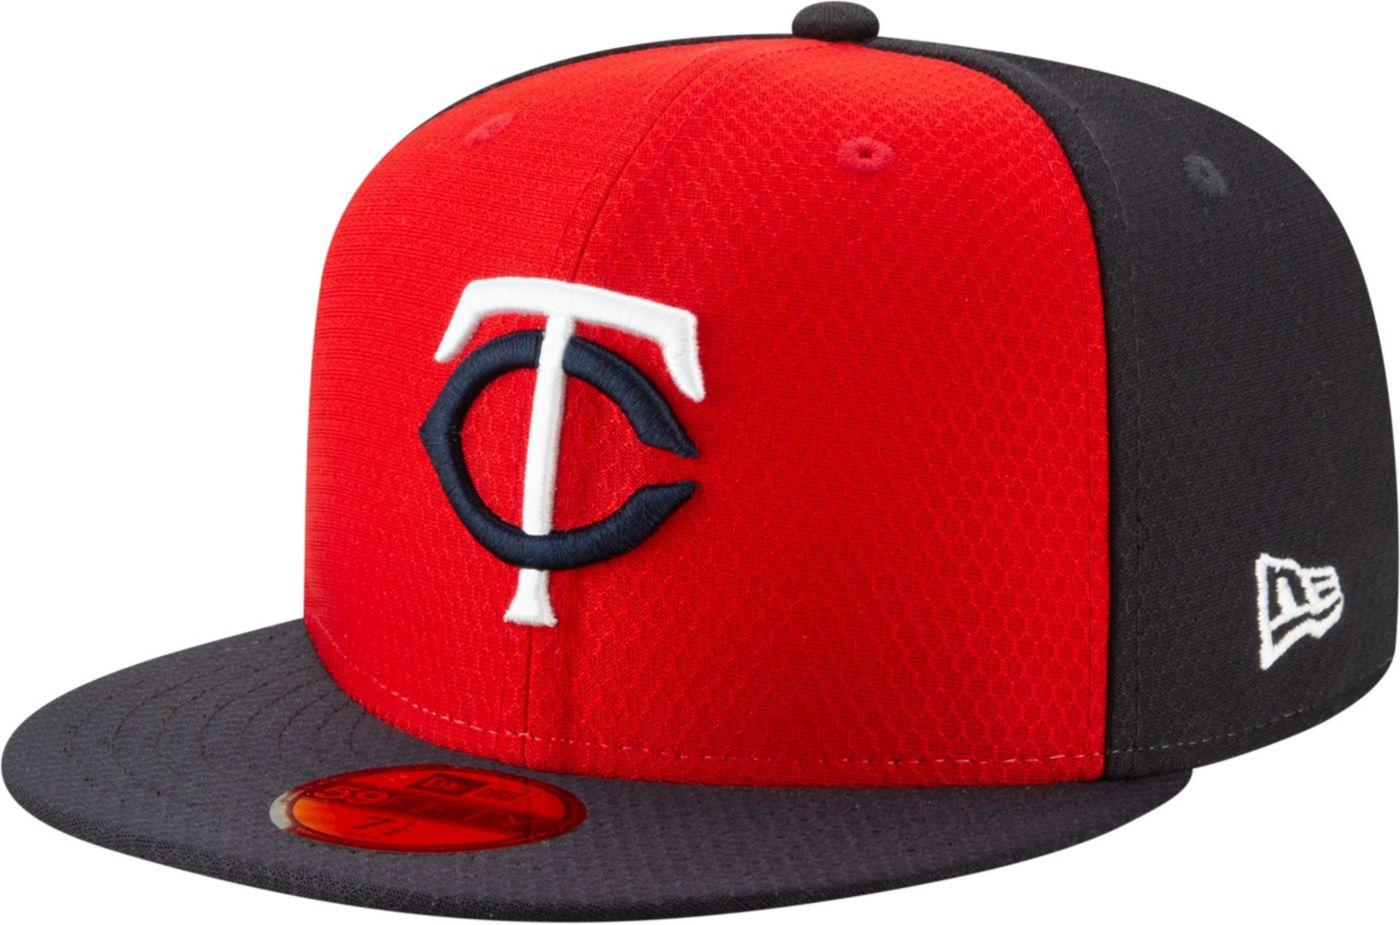 New Era Men's Minnesota Twins 59Fifty HexTech Batting Practice Fitted Hat